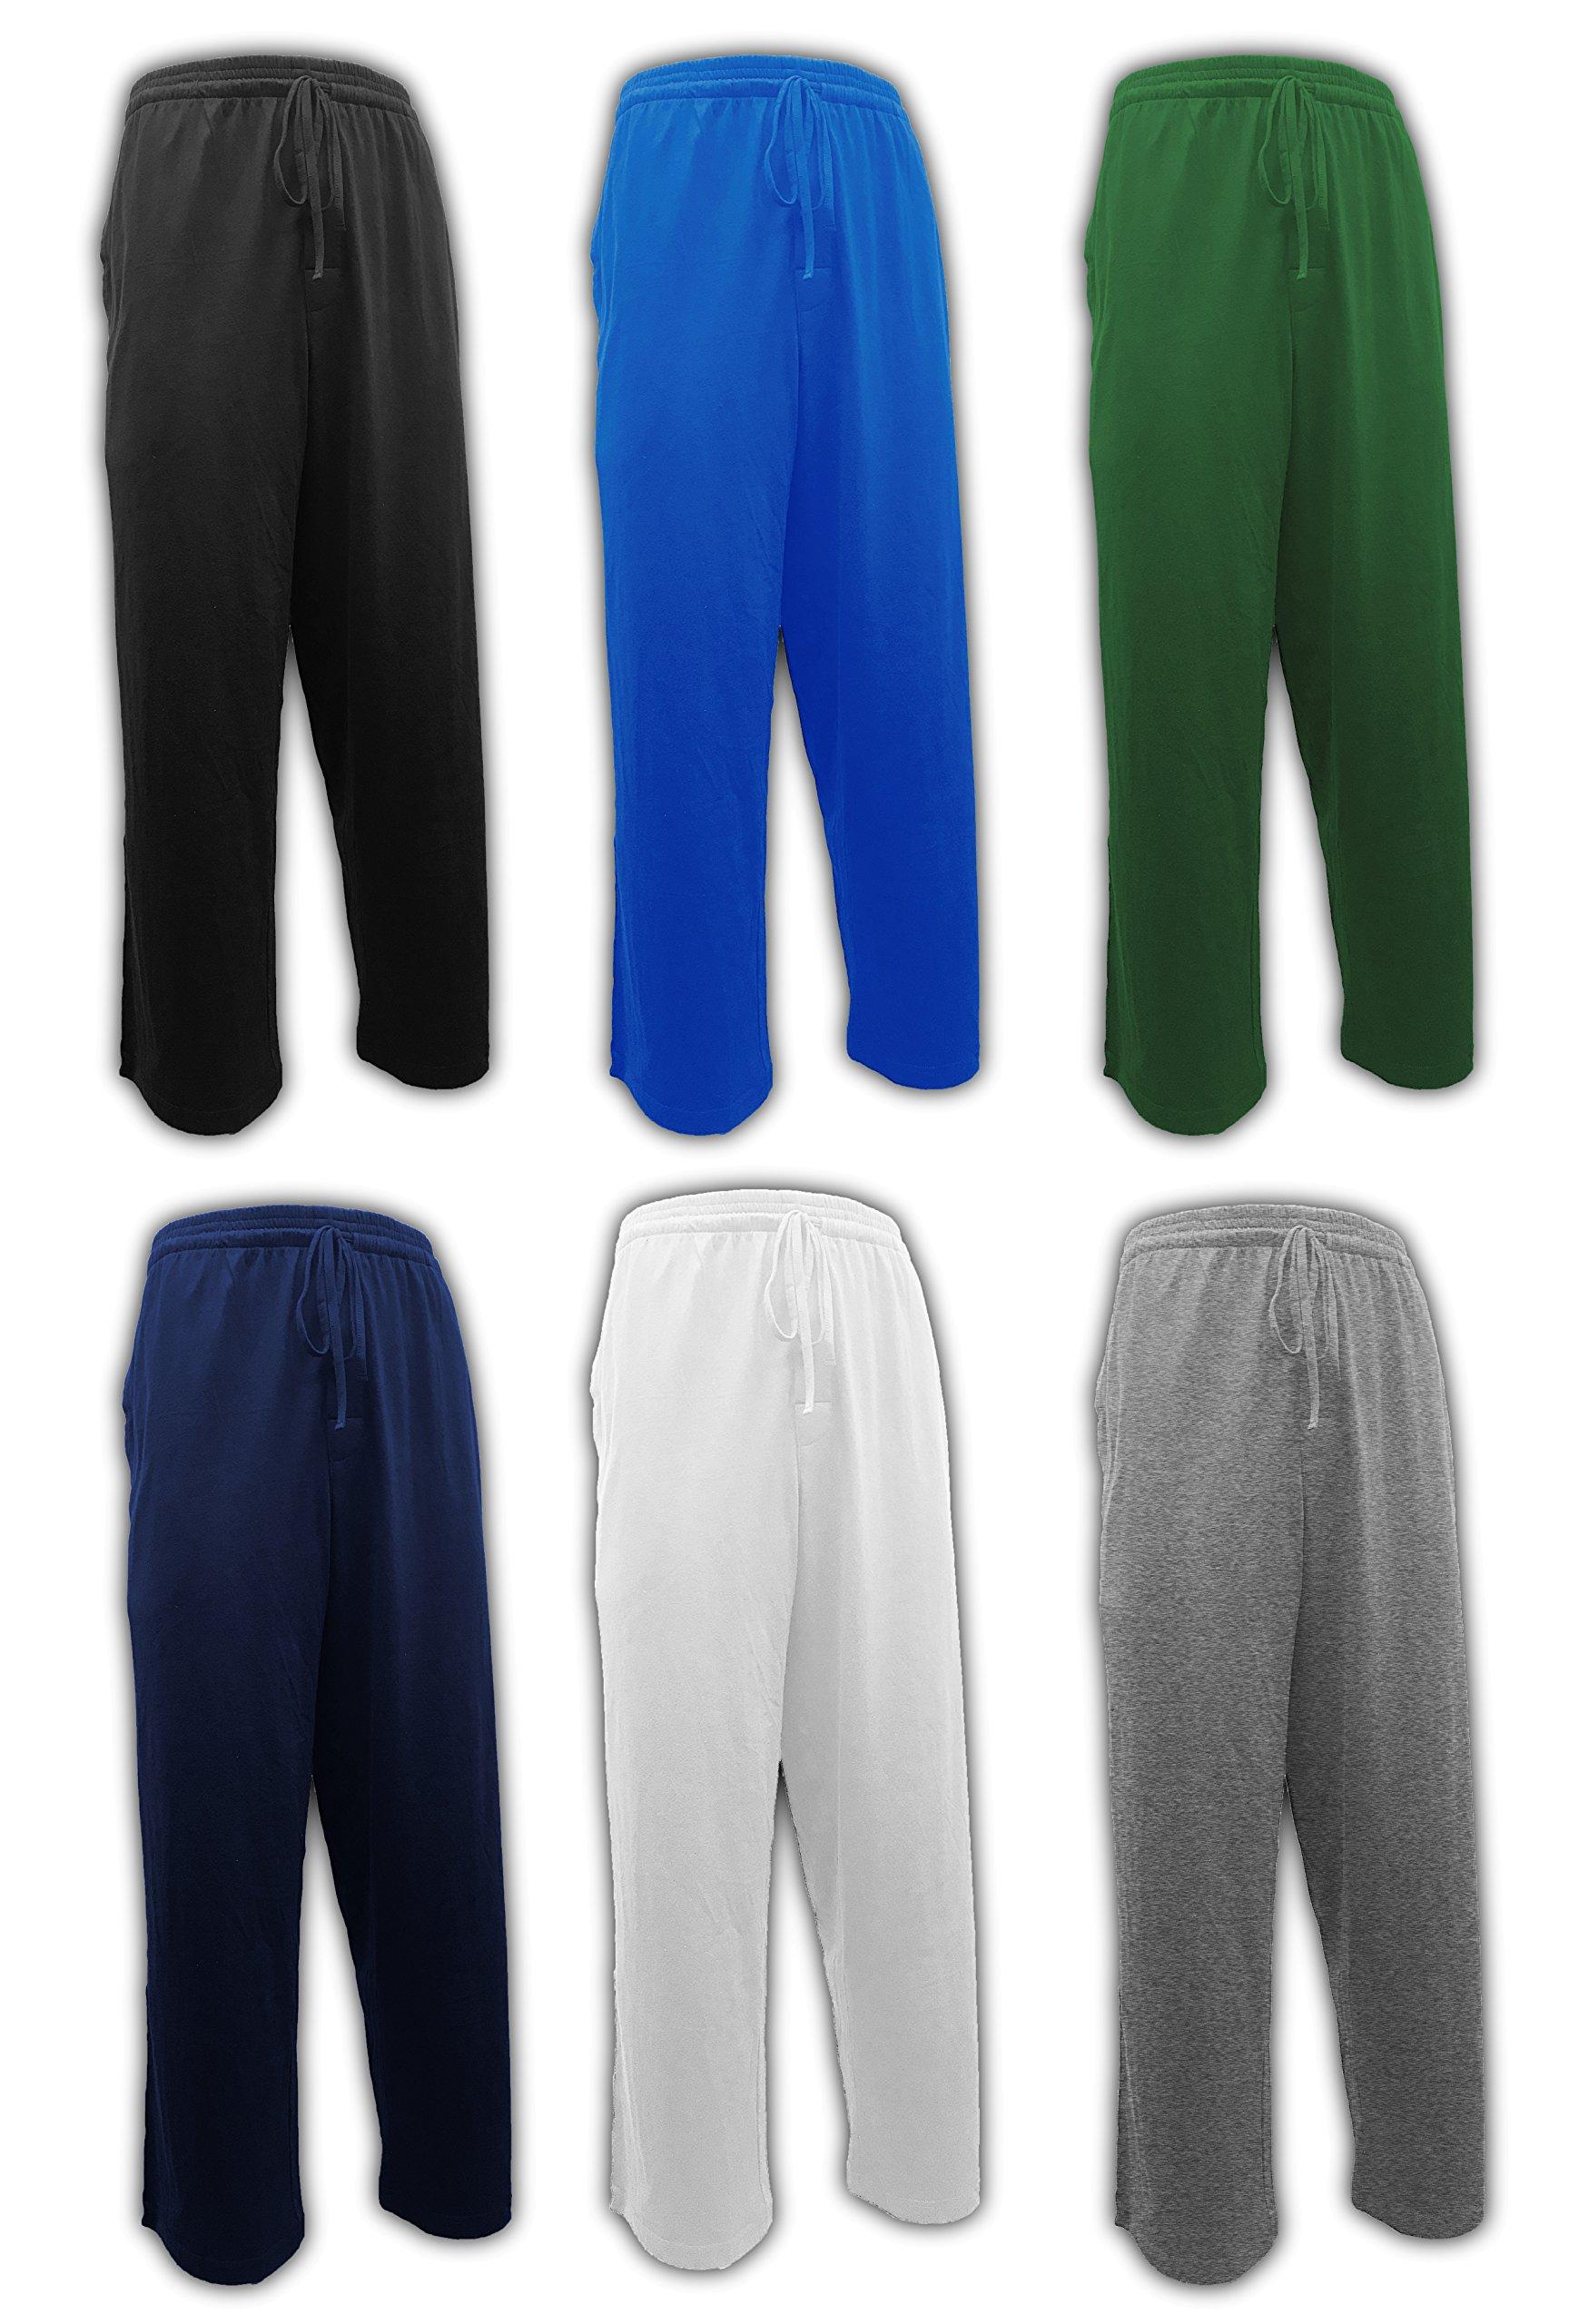 Andrew Scott Men's 6 Pack 100% Cotton Jersey Knit Yoga Lounge & Sleep Pajama Pants (6 Pack - Navy/Black/Royal/Hunter/White/Grey, Medium) by Andrew Scott (Image #1)